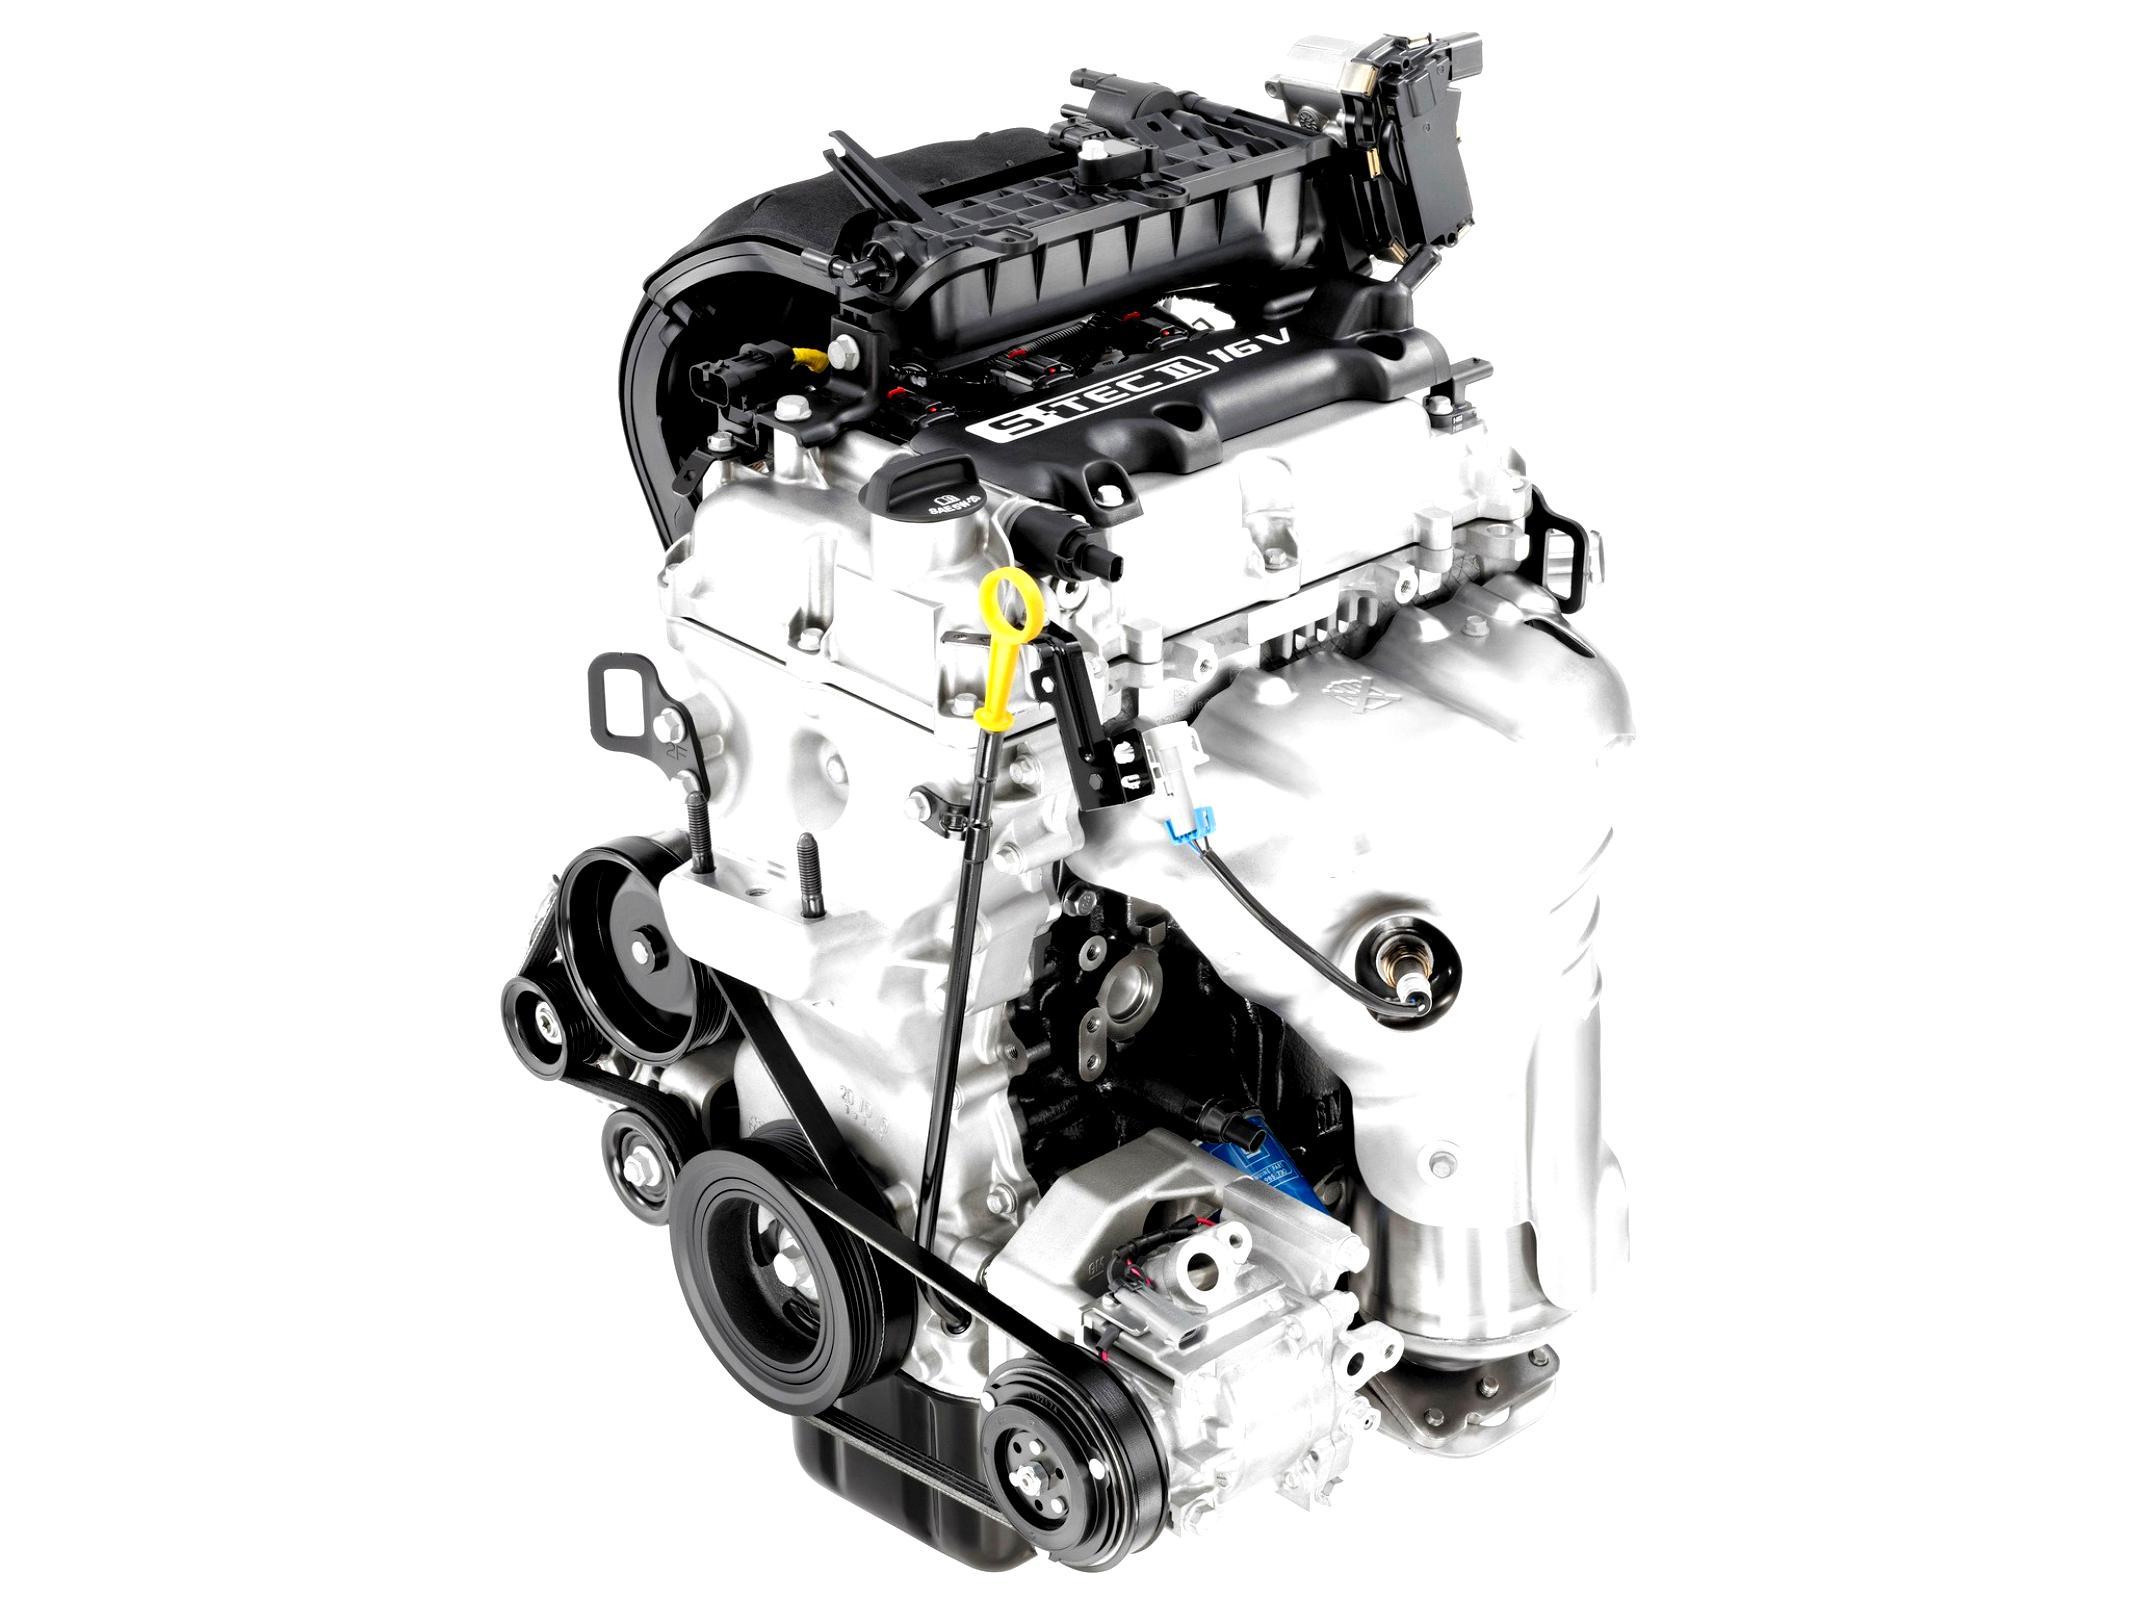 Chevrolet Matiz / Spark M300 2009 on MotoImg.com